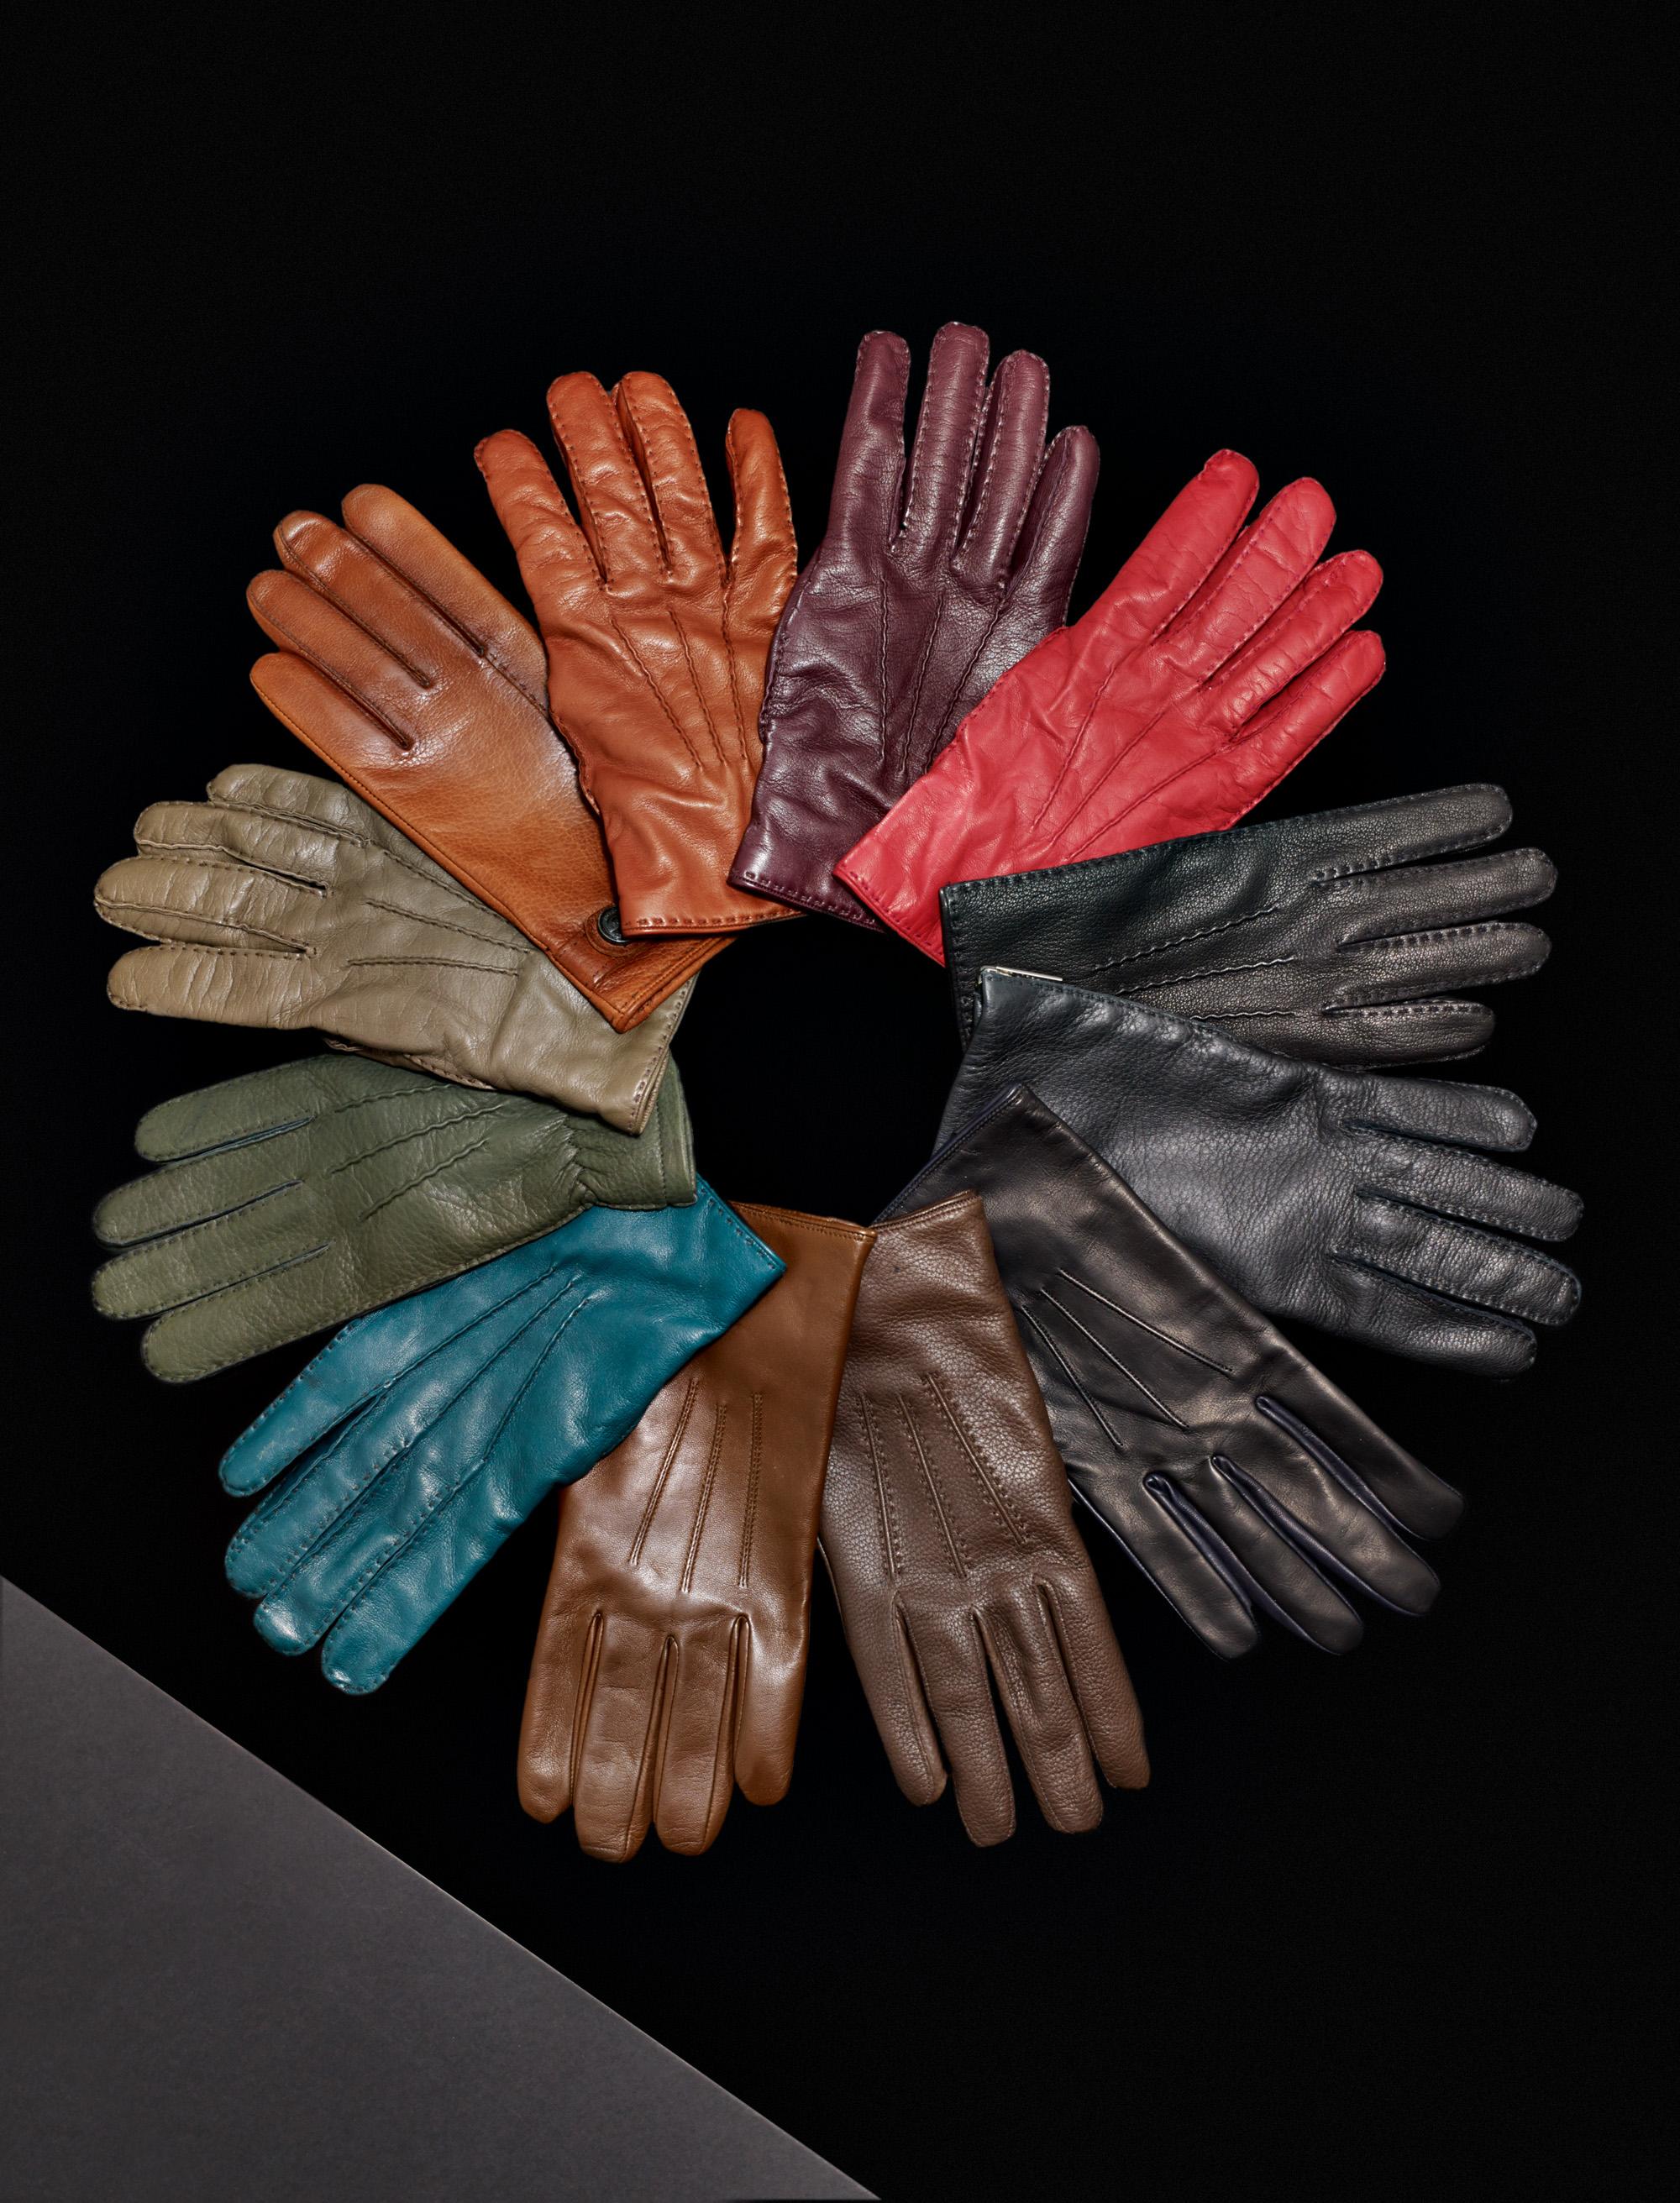 Gloves_0109_contrast.jpg